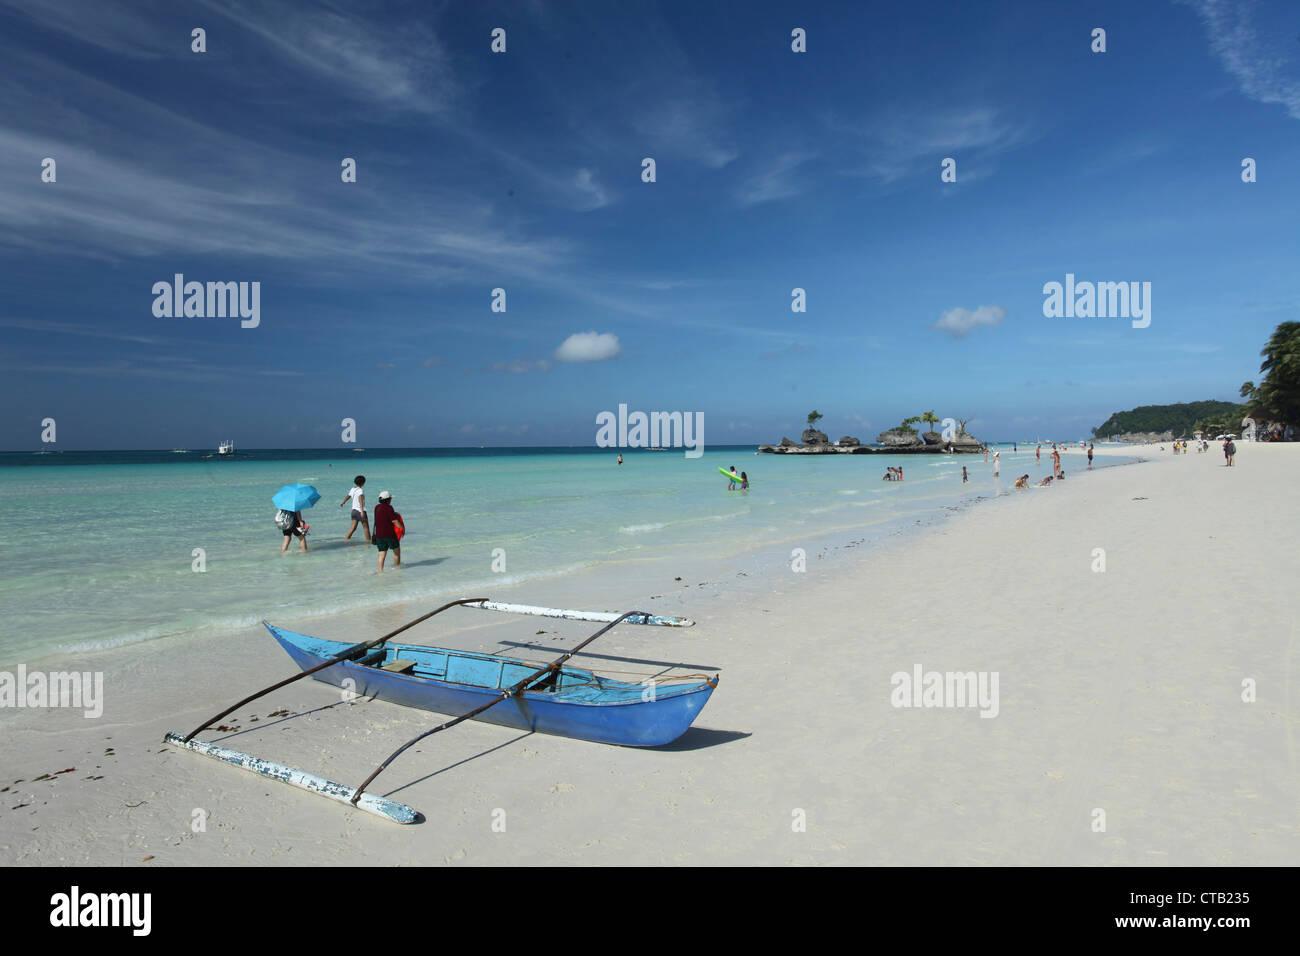 White Beach with fishing boat, Boracay, Panay Island, Visayas, Philippines - Stock Image